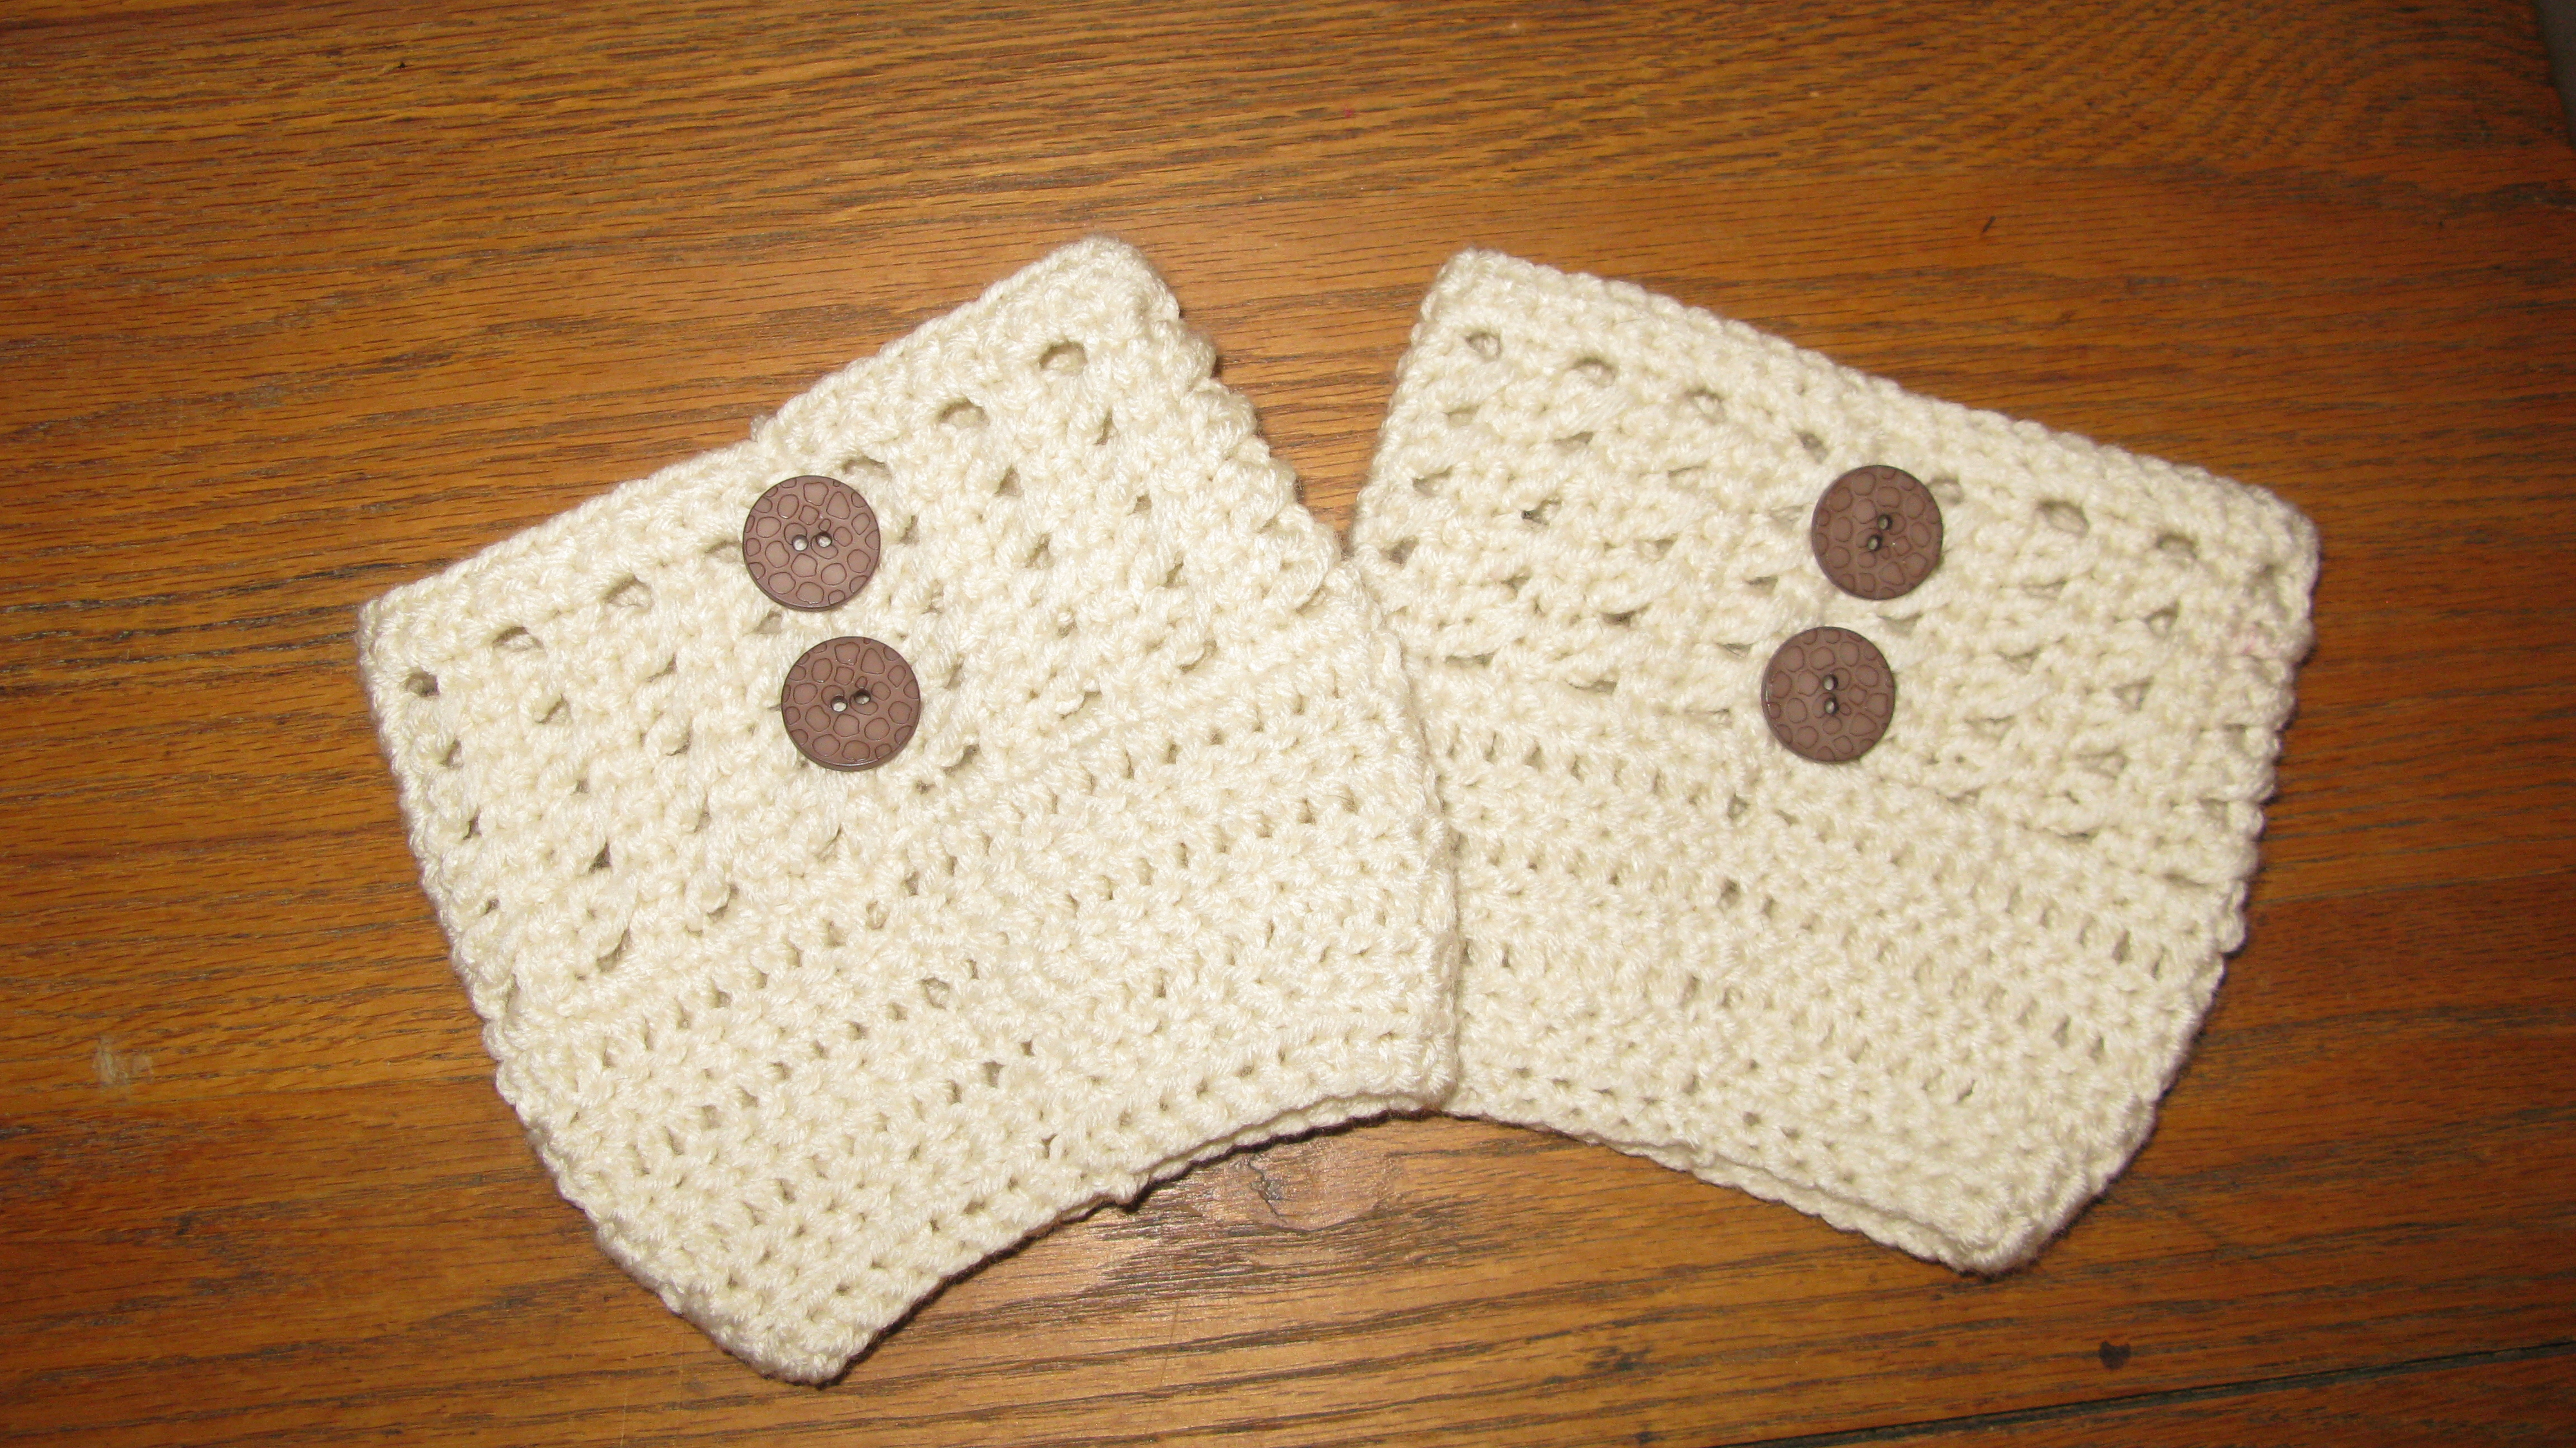 Crochet Hat Patterns With Cuff : Girls ELK Studio ? Handcrafted Crochet Designs Page 2